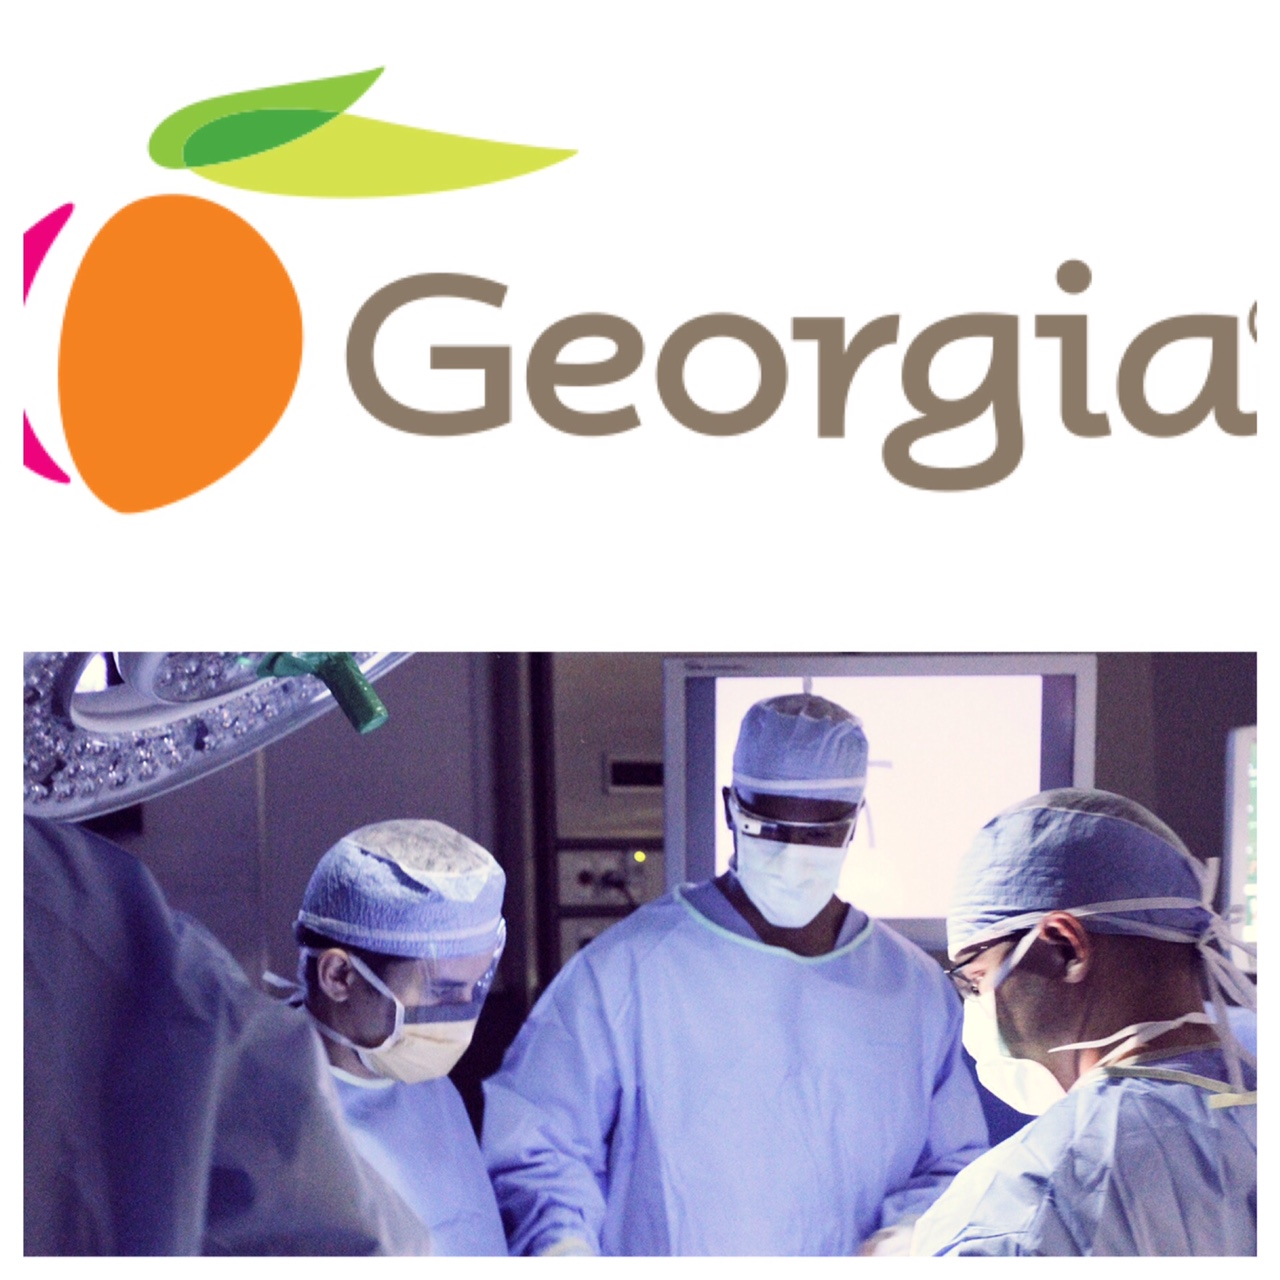 Find a Qualified Malpractice Attorney in Georgia